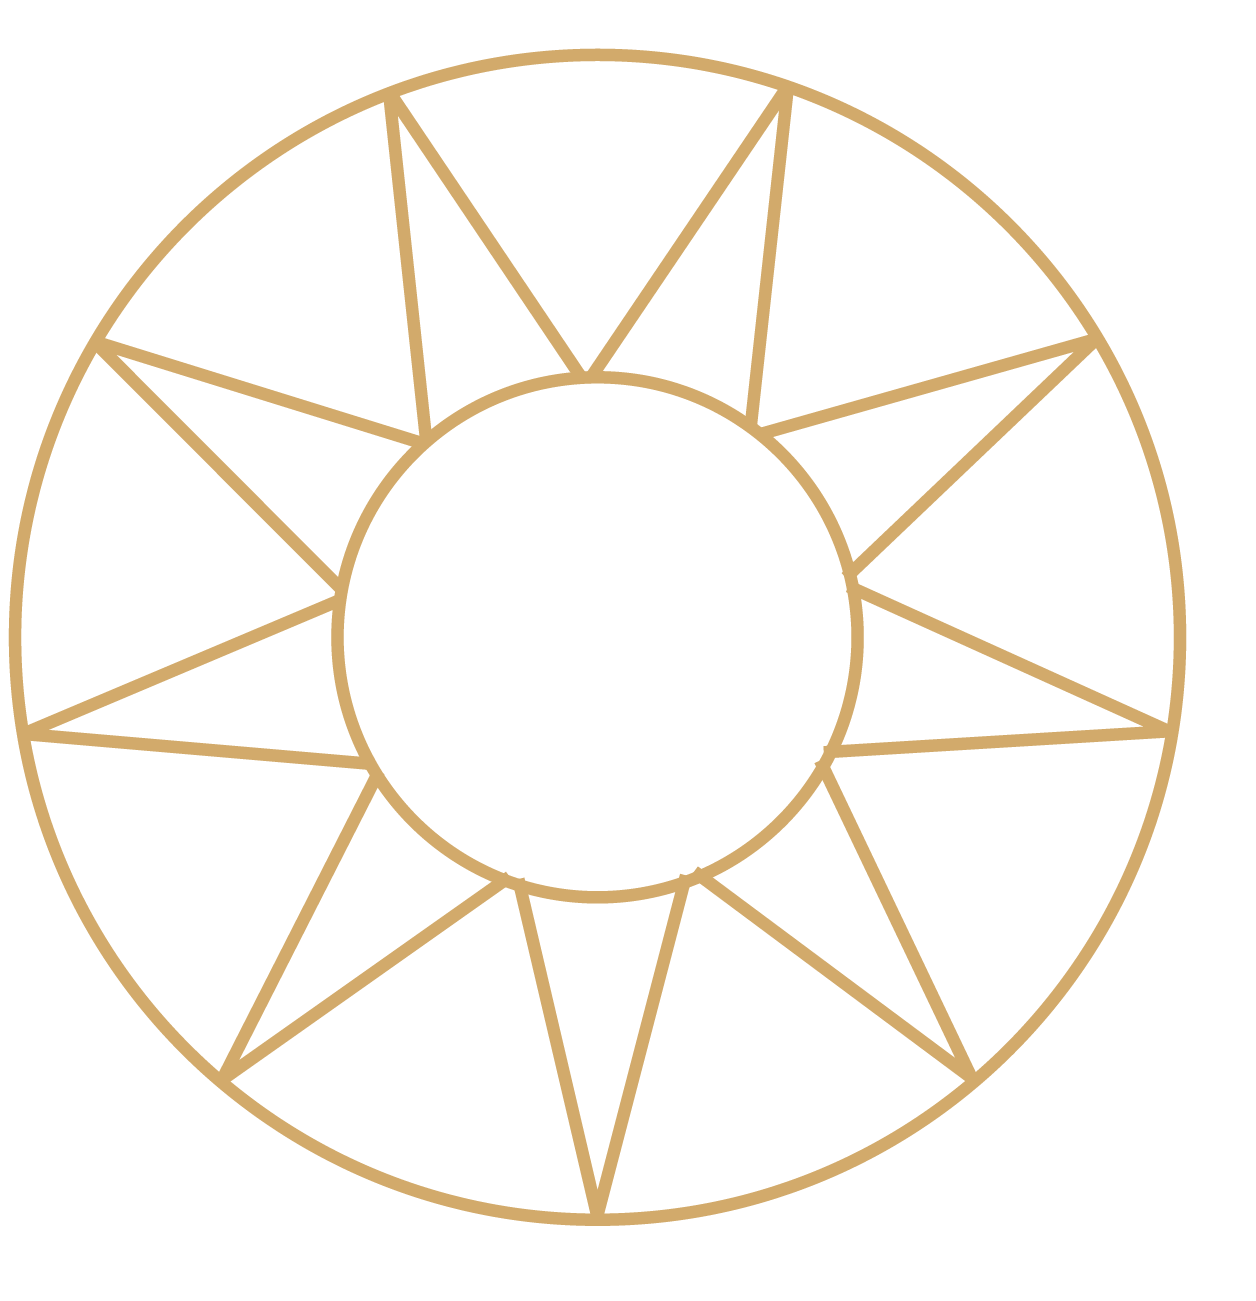 Tribal Shaman-Design-Kit-03.png